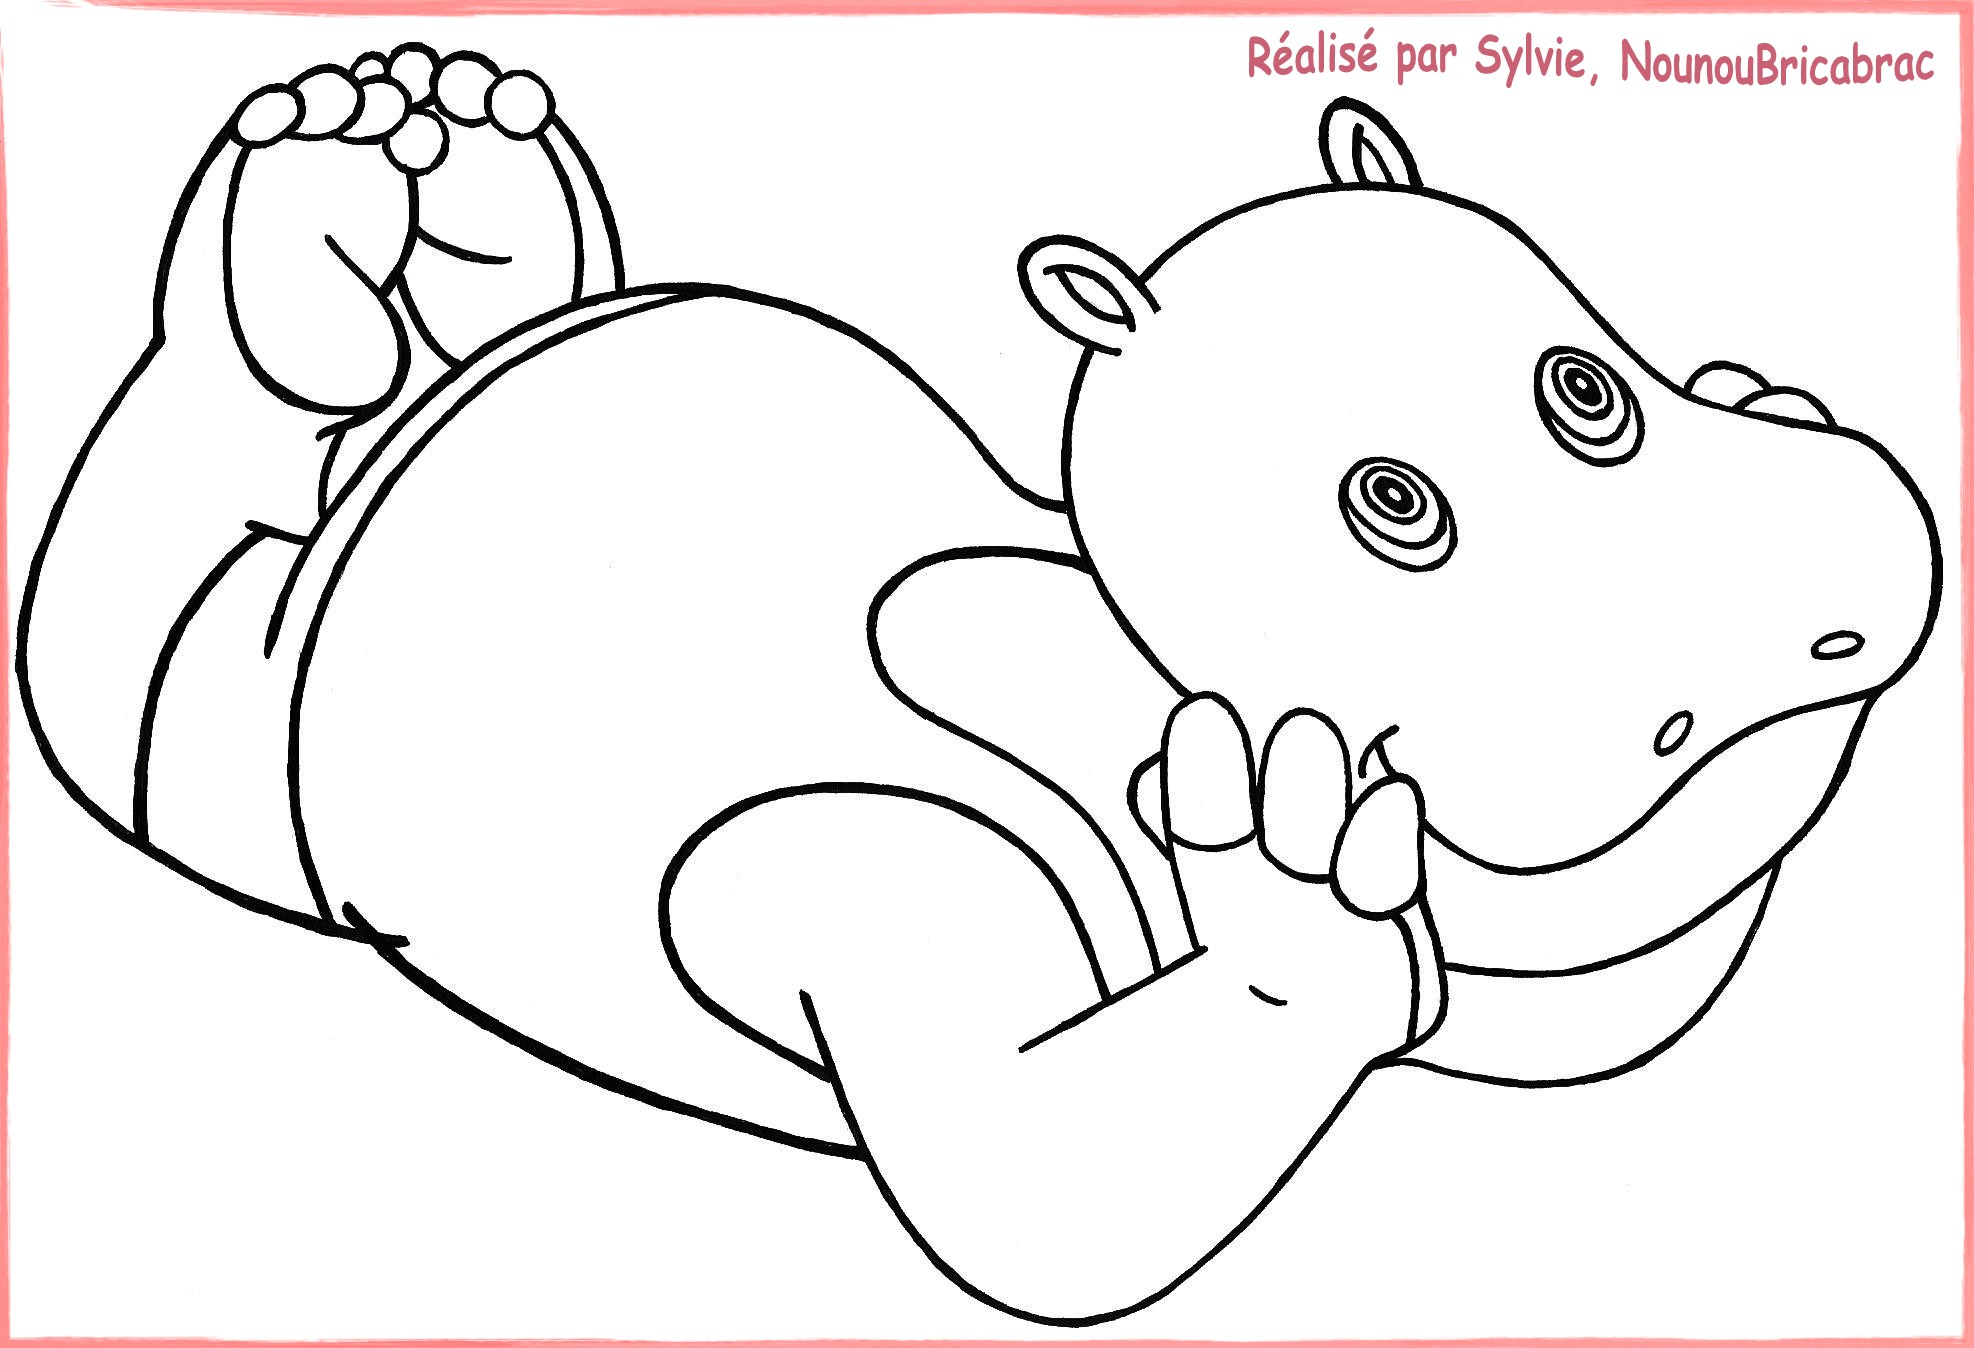 23 Dessins De Coloriage Hippopotame à Imprimer